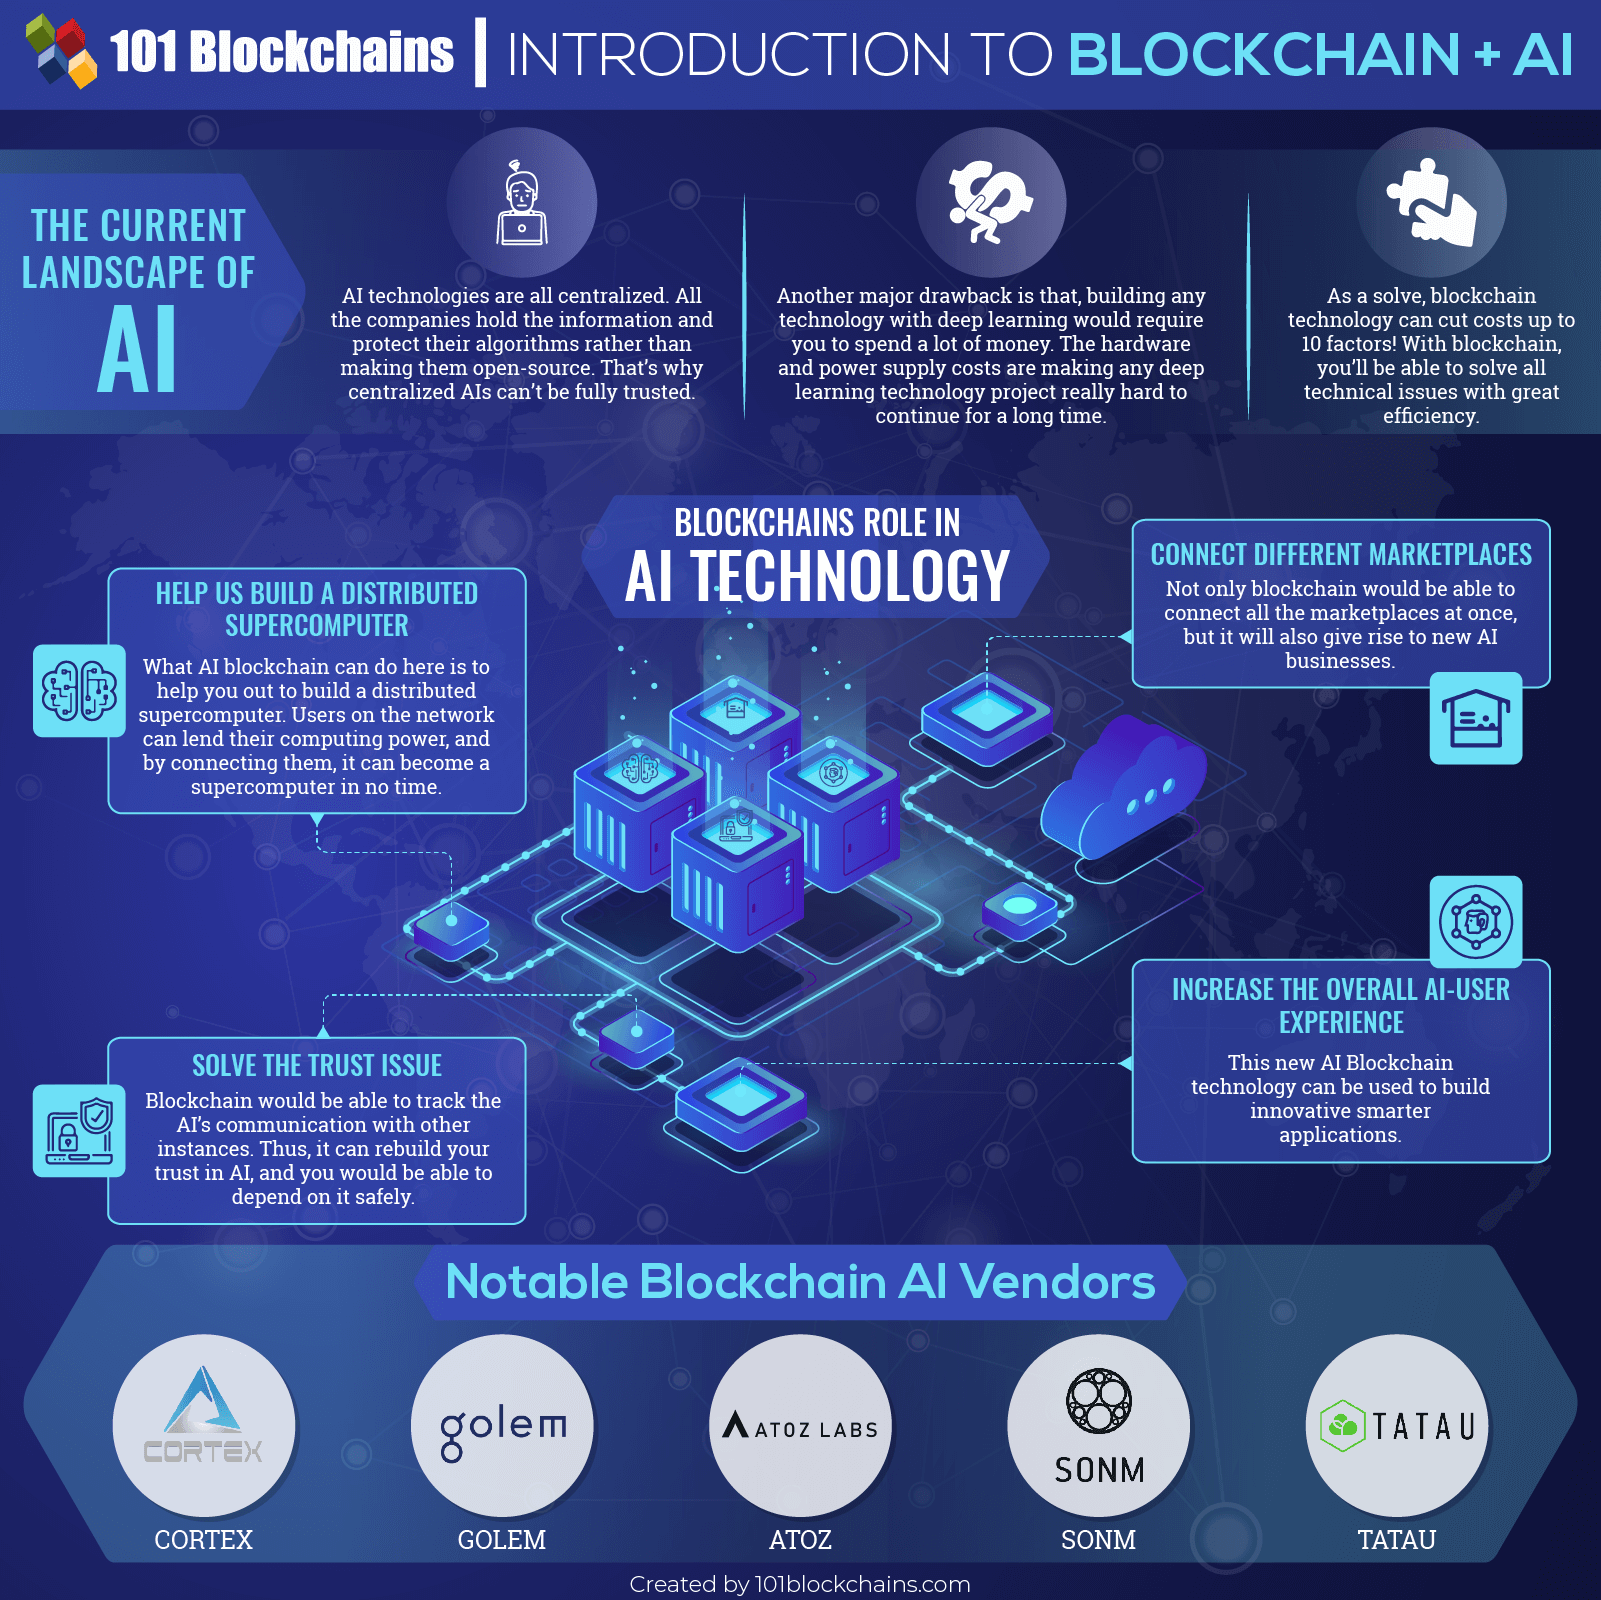 Introduction to Blockchain + AI